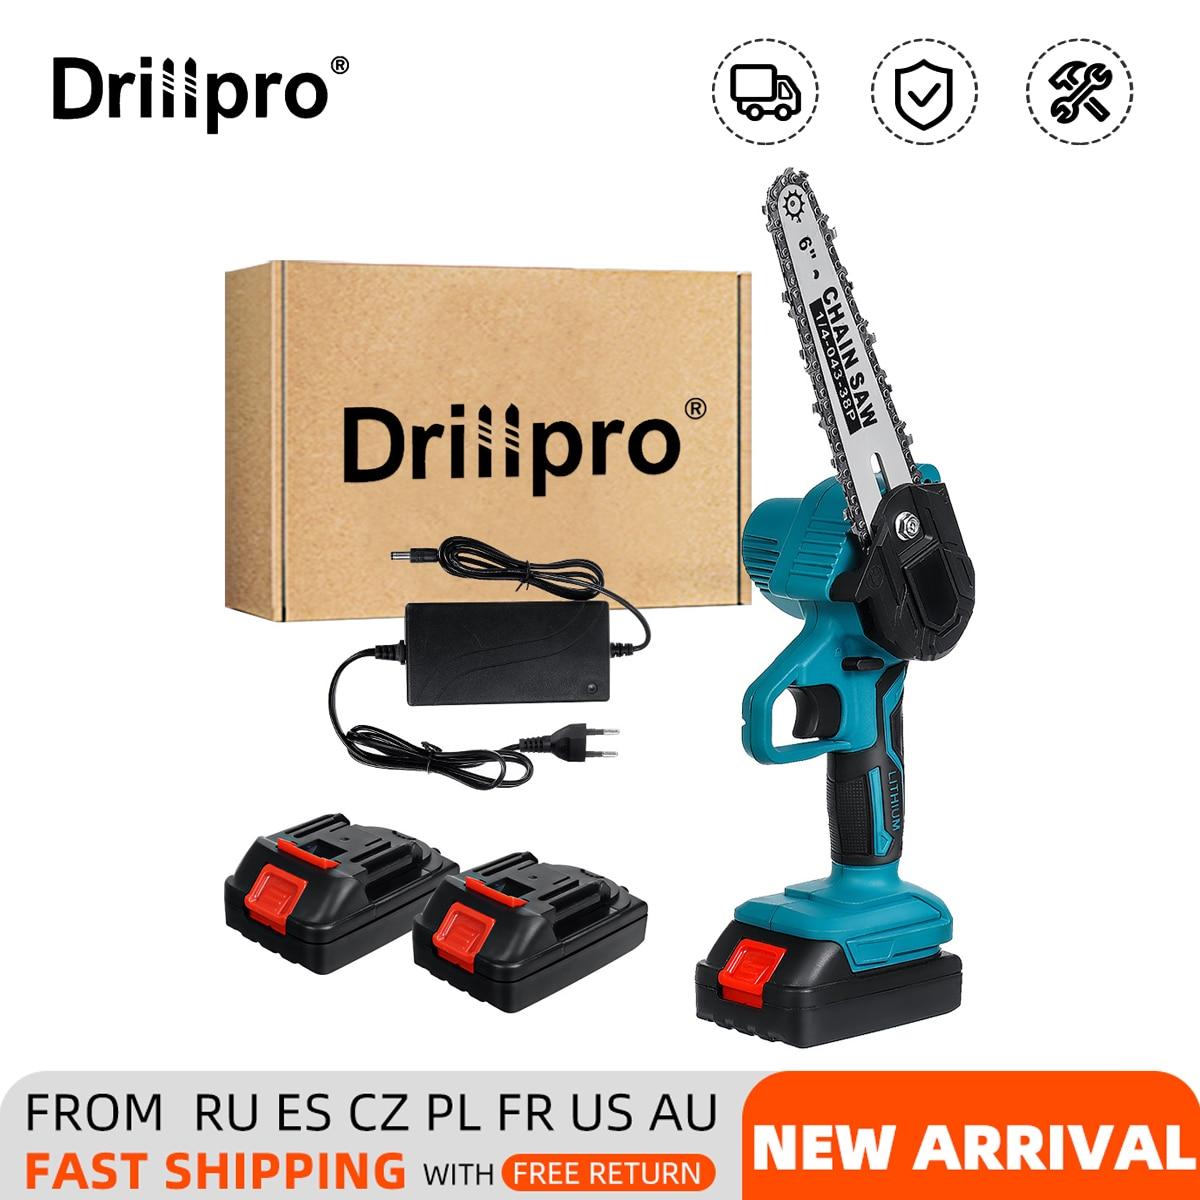 Drillpro-منشار كهربائي لاسلكي ، 6 بوصات ، منشار تقليم ، تشذيب شجرة الحديقة ، قاطع نجارة لبطارية Makiita 18 فولت